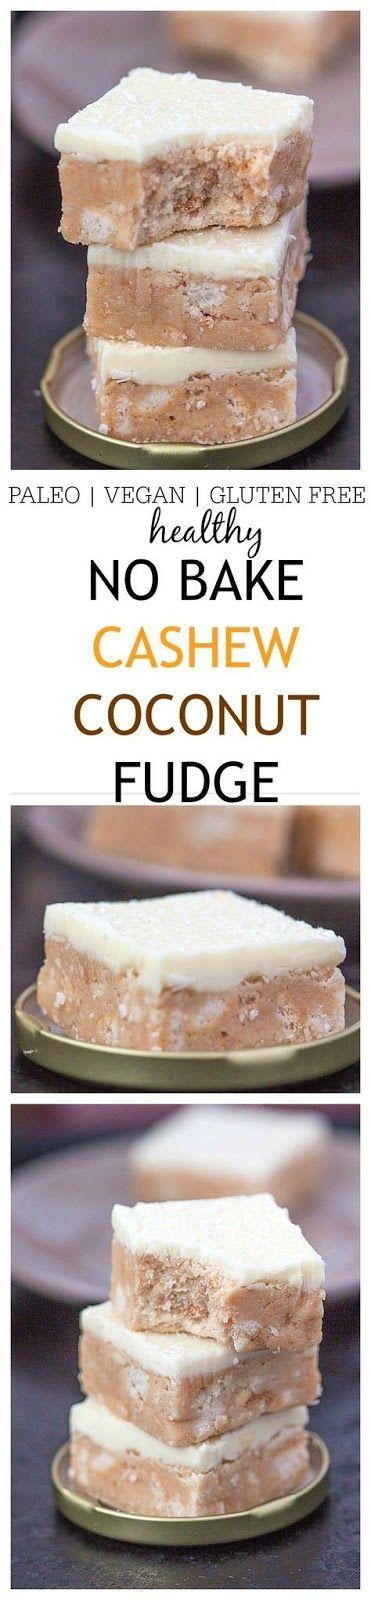 Paleo Cashew Coconut Protein Fudge | Food And Cake Recipes